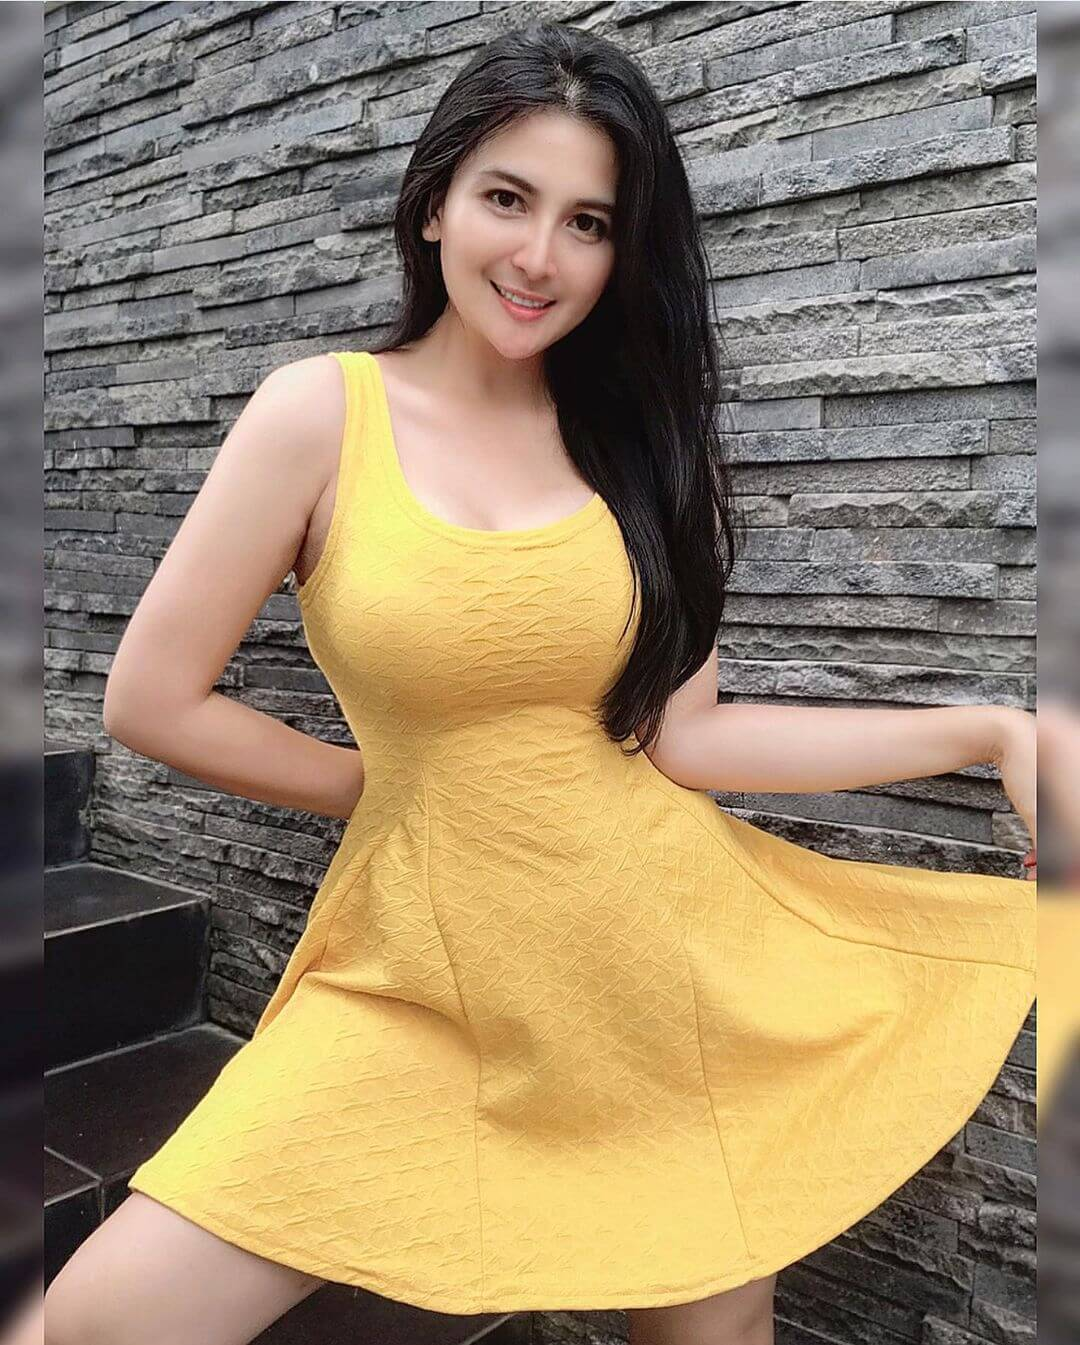 Dianna Dee Starlight In Yellow Dress